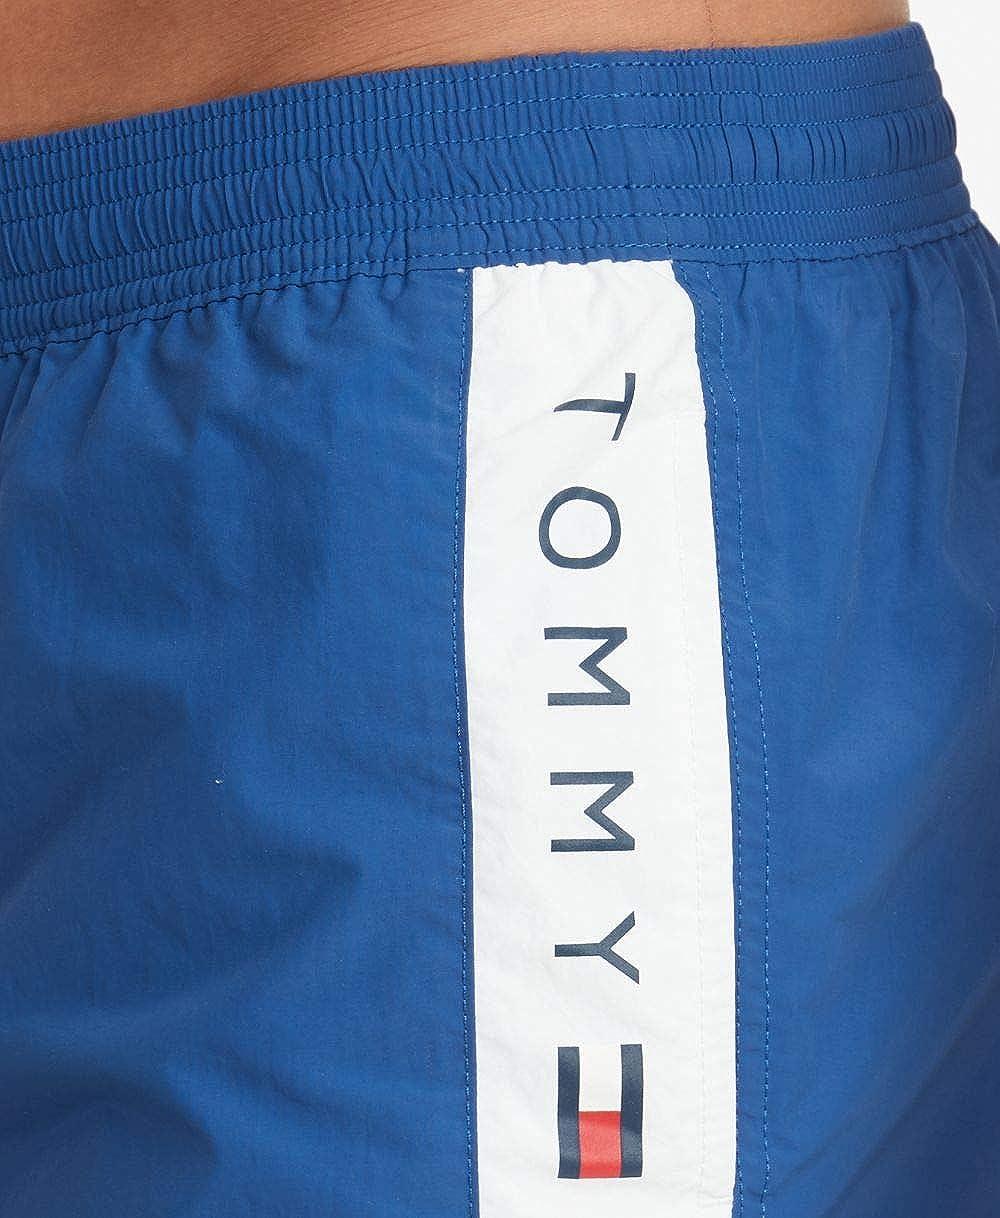 Tommy Hilfiger Mens 7 Swim Trunks